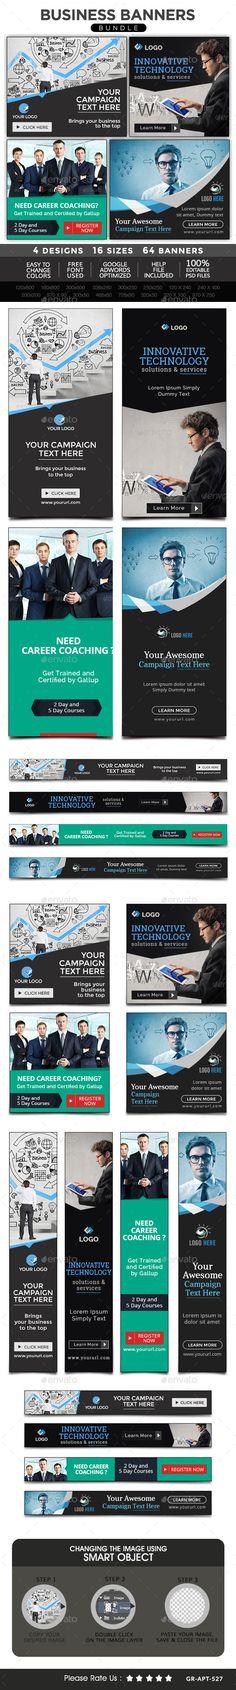 Business Banners Bundle - 4 Sets Download: http://graphicriver.net/item/business-banners-bundle-4-sets/11016923?ref=ksioks